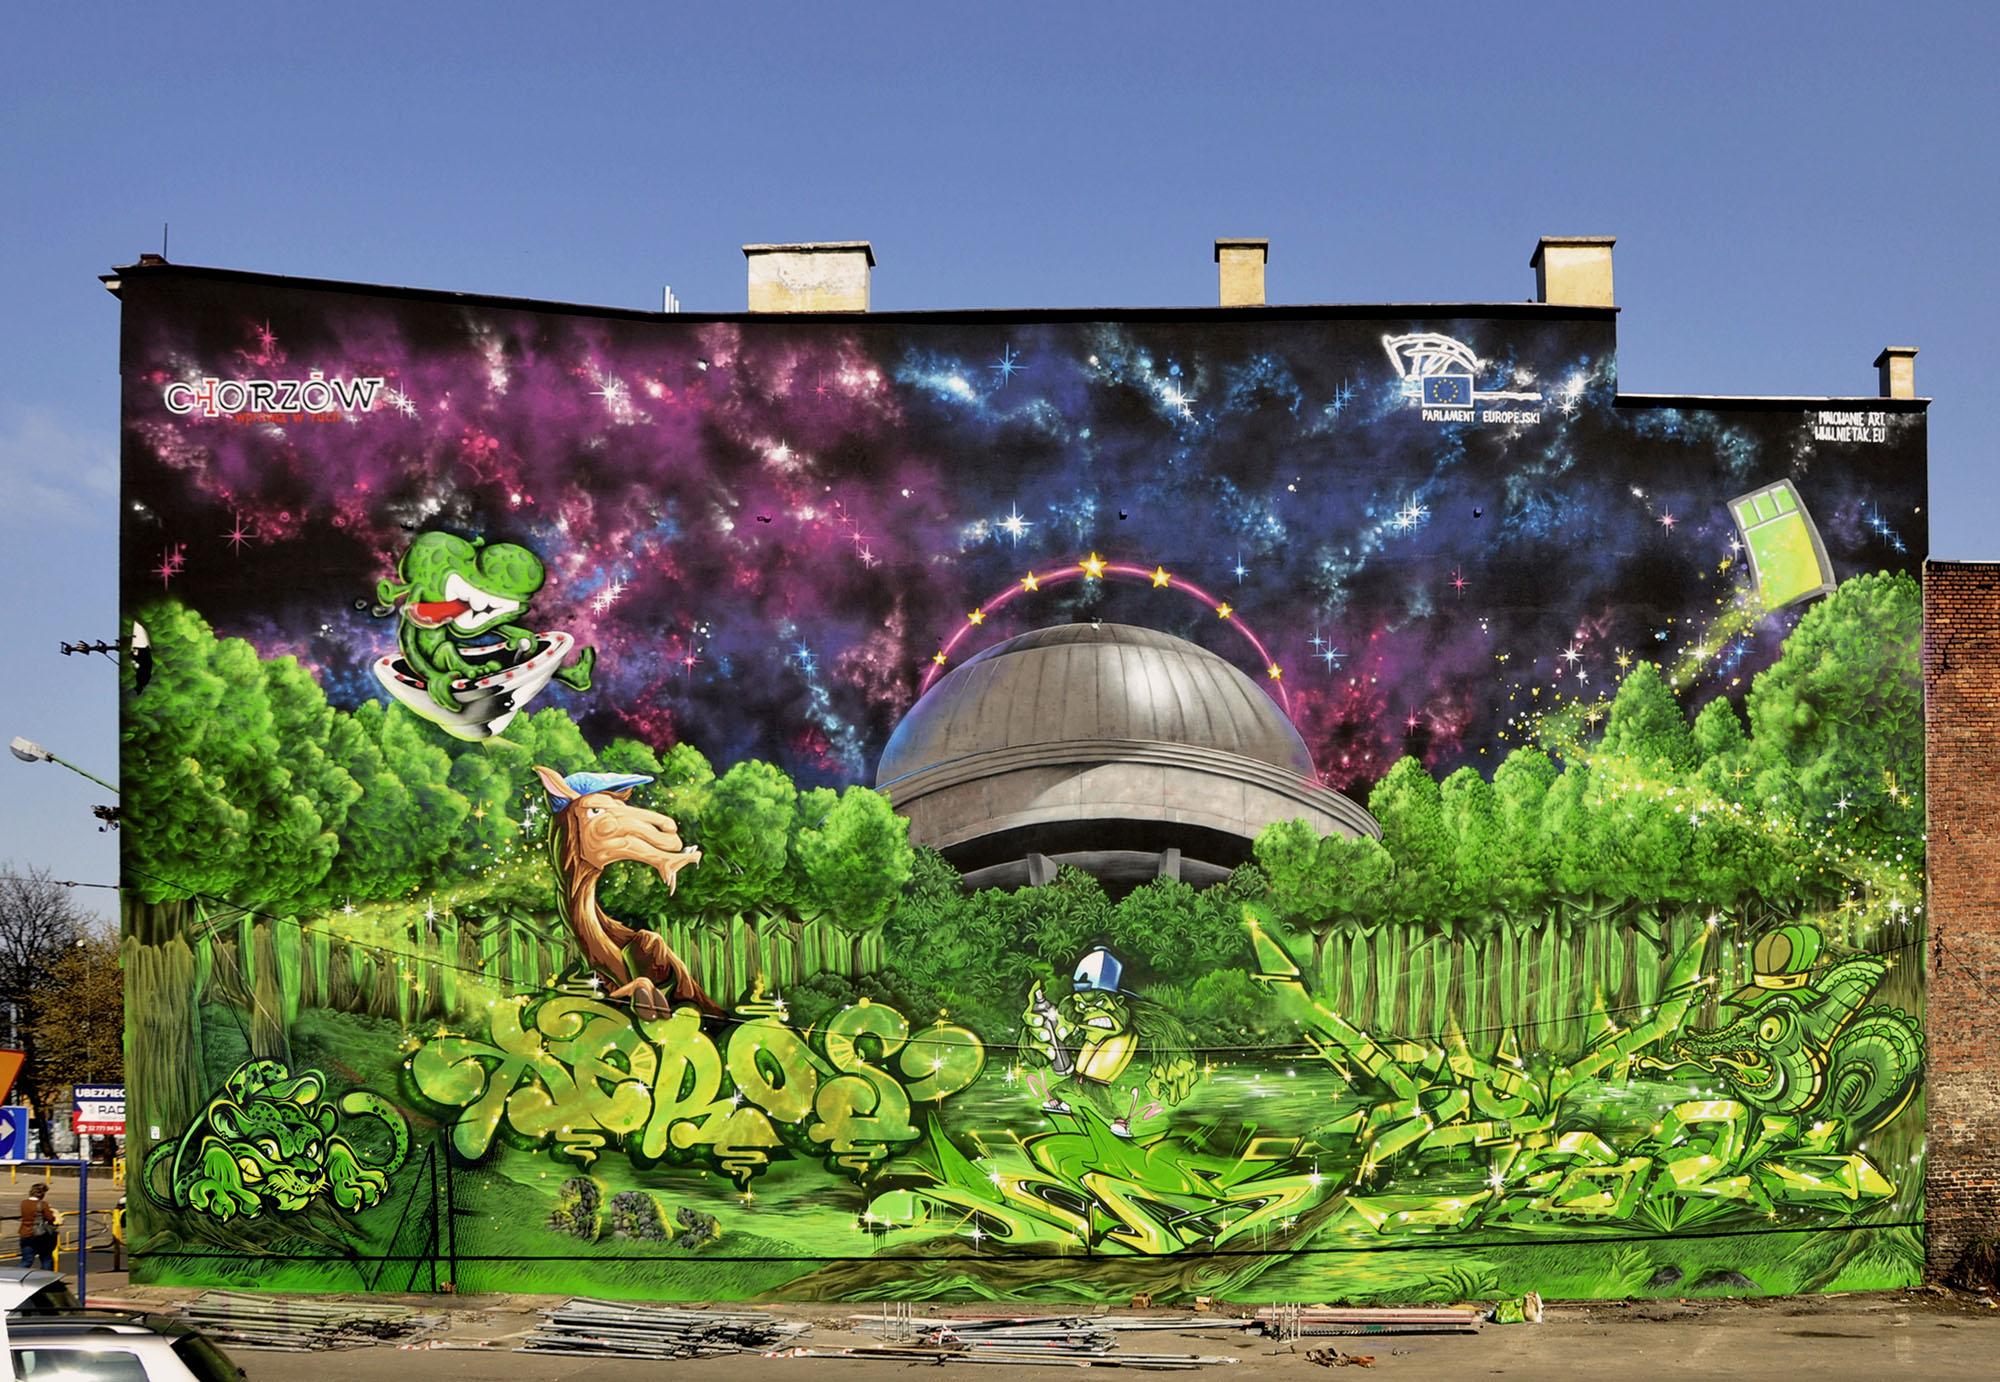 sw307crew-chorzow-mural-15.jpg